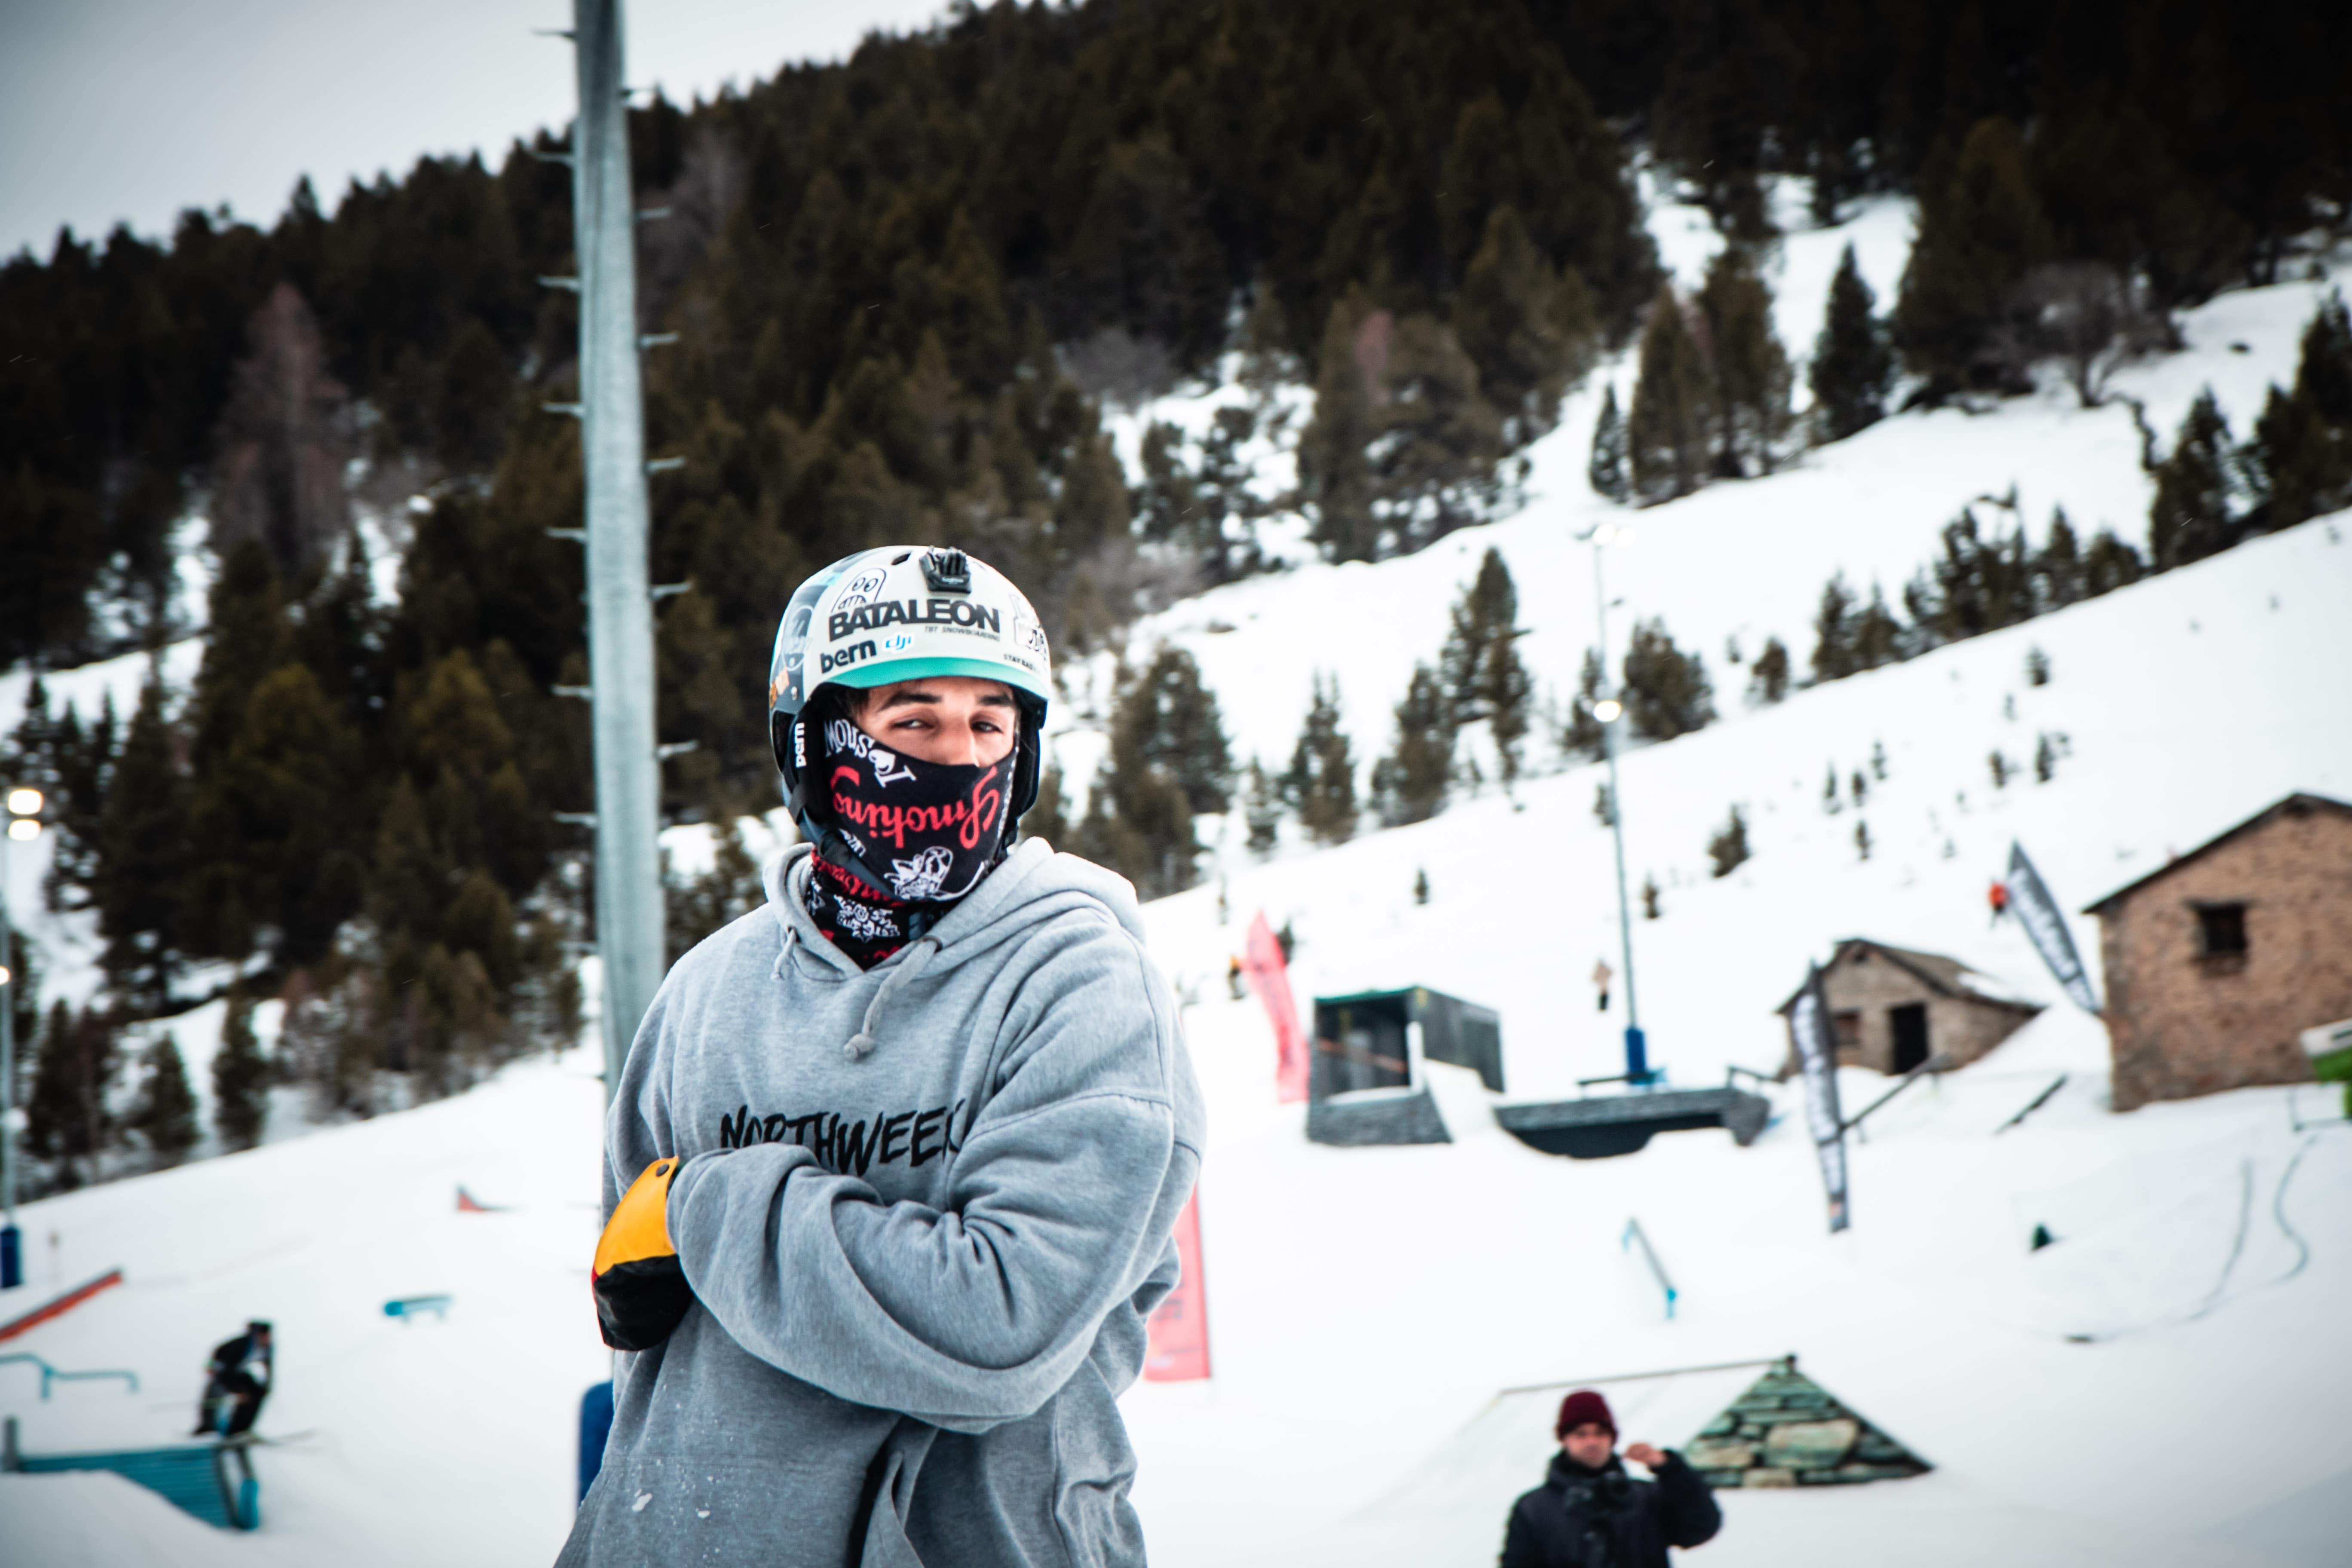 snowpark peretol